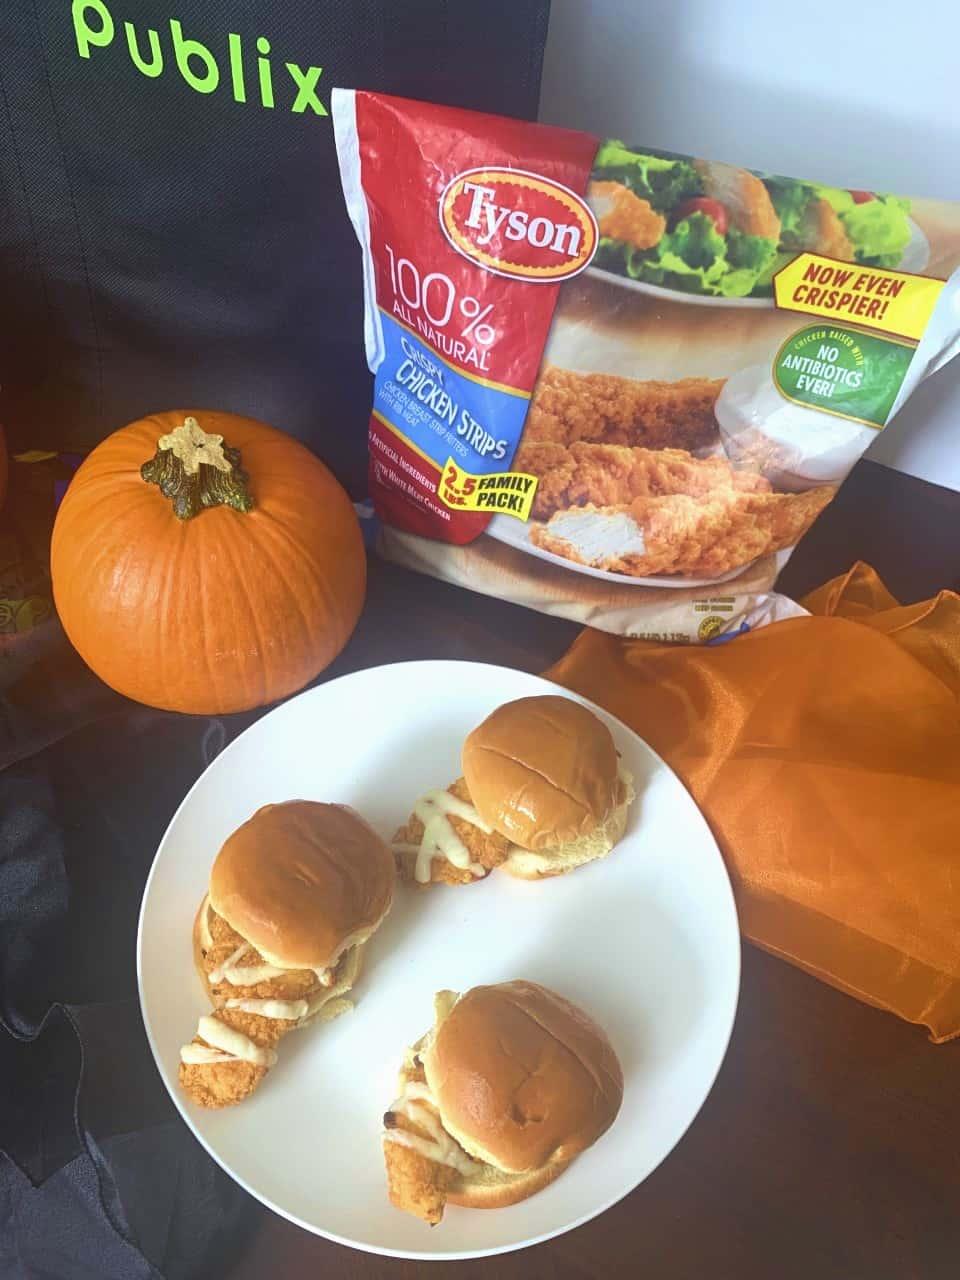 Mummy Sliders with Tyson® Chicken Tenders